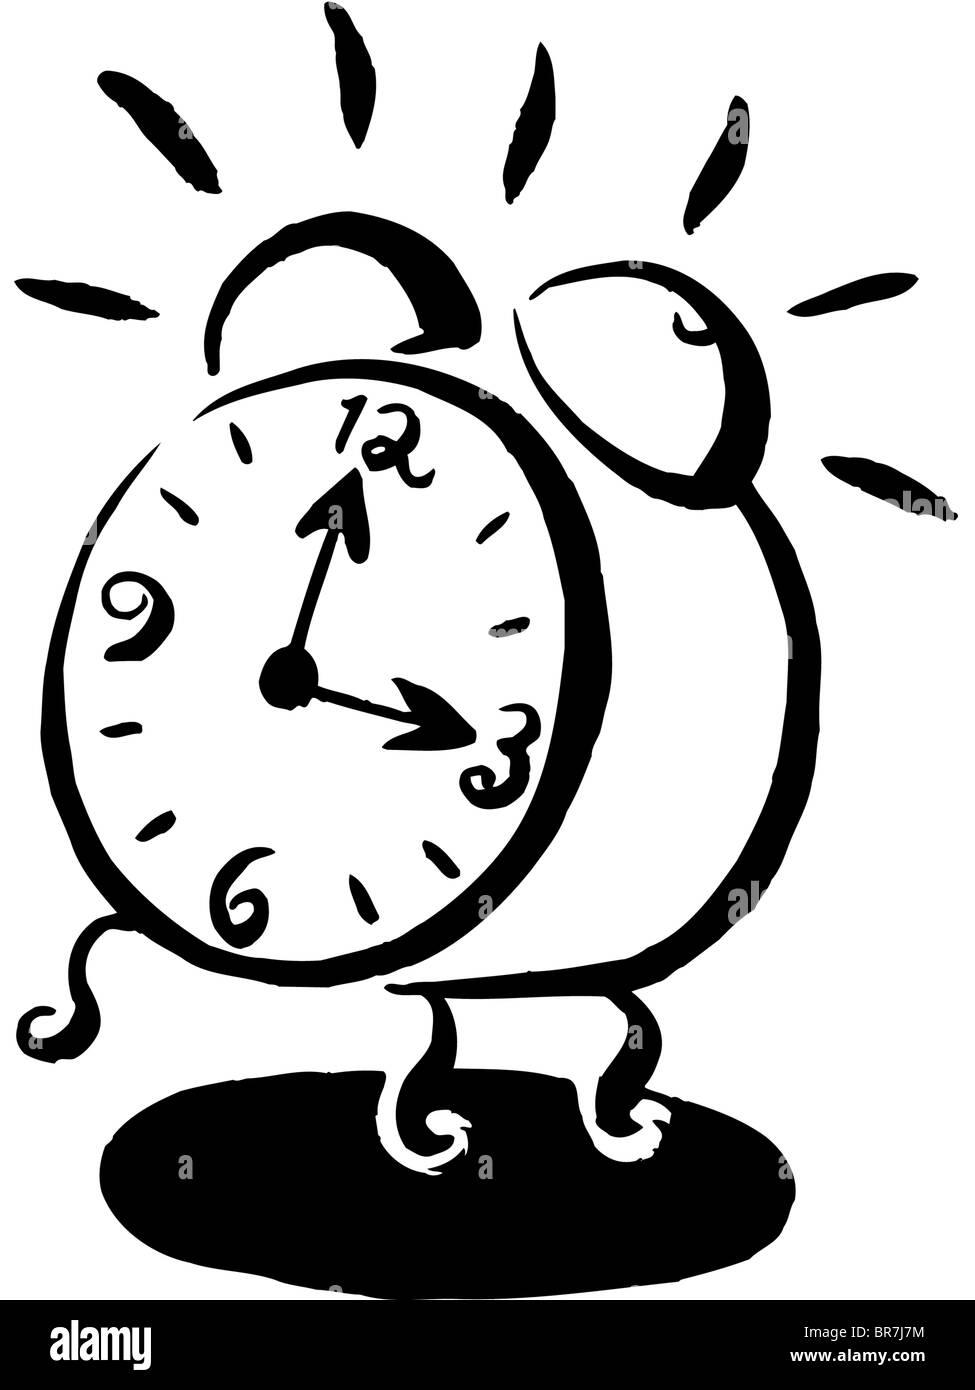 Cartoon Clock Black And White | www.pixshark.com - Images ...